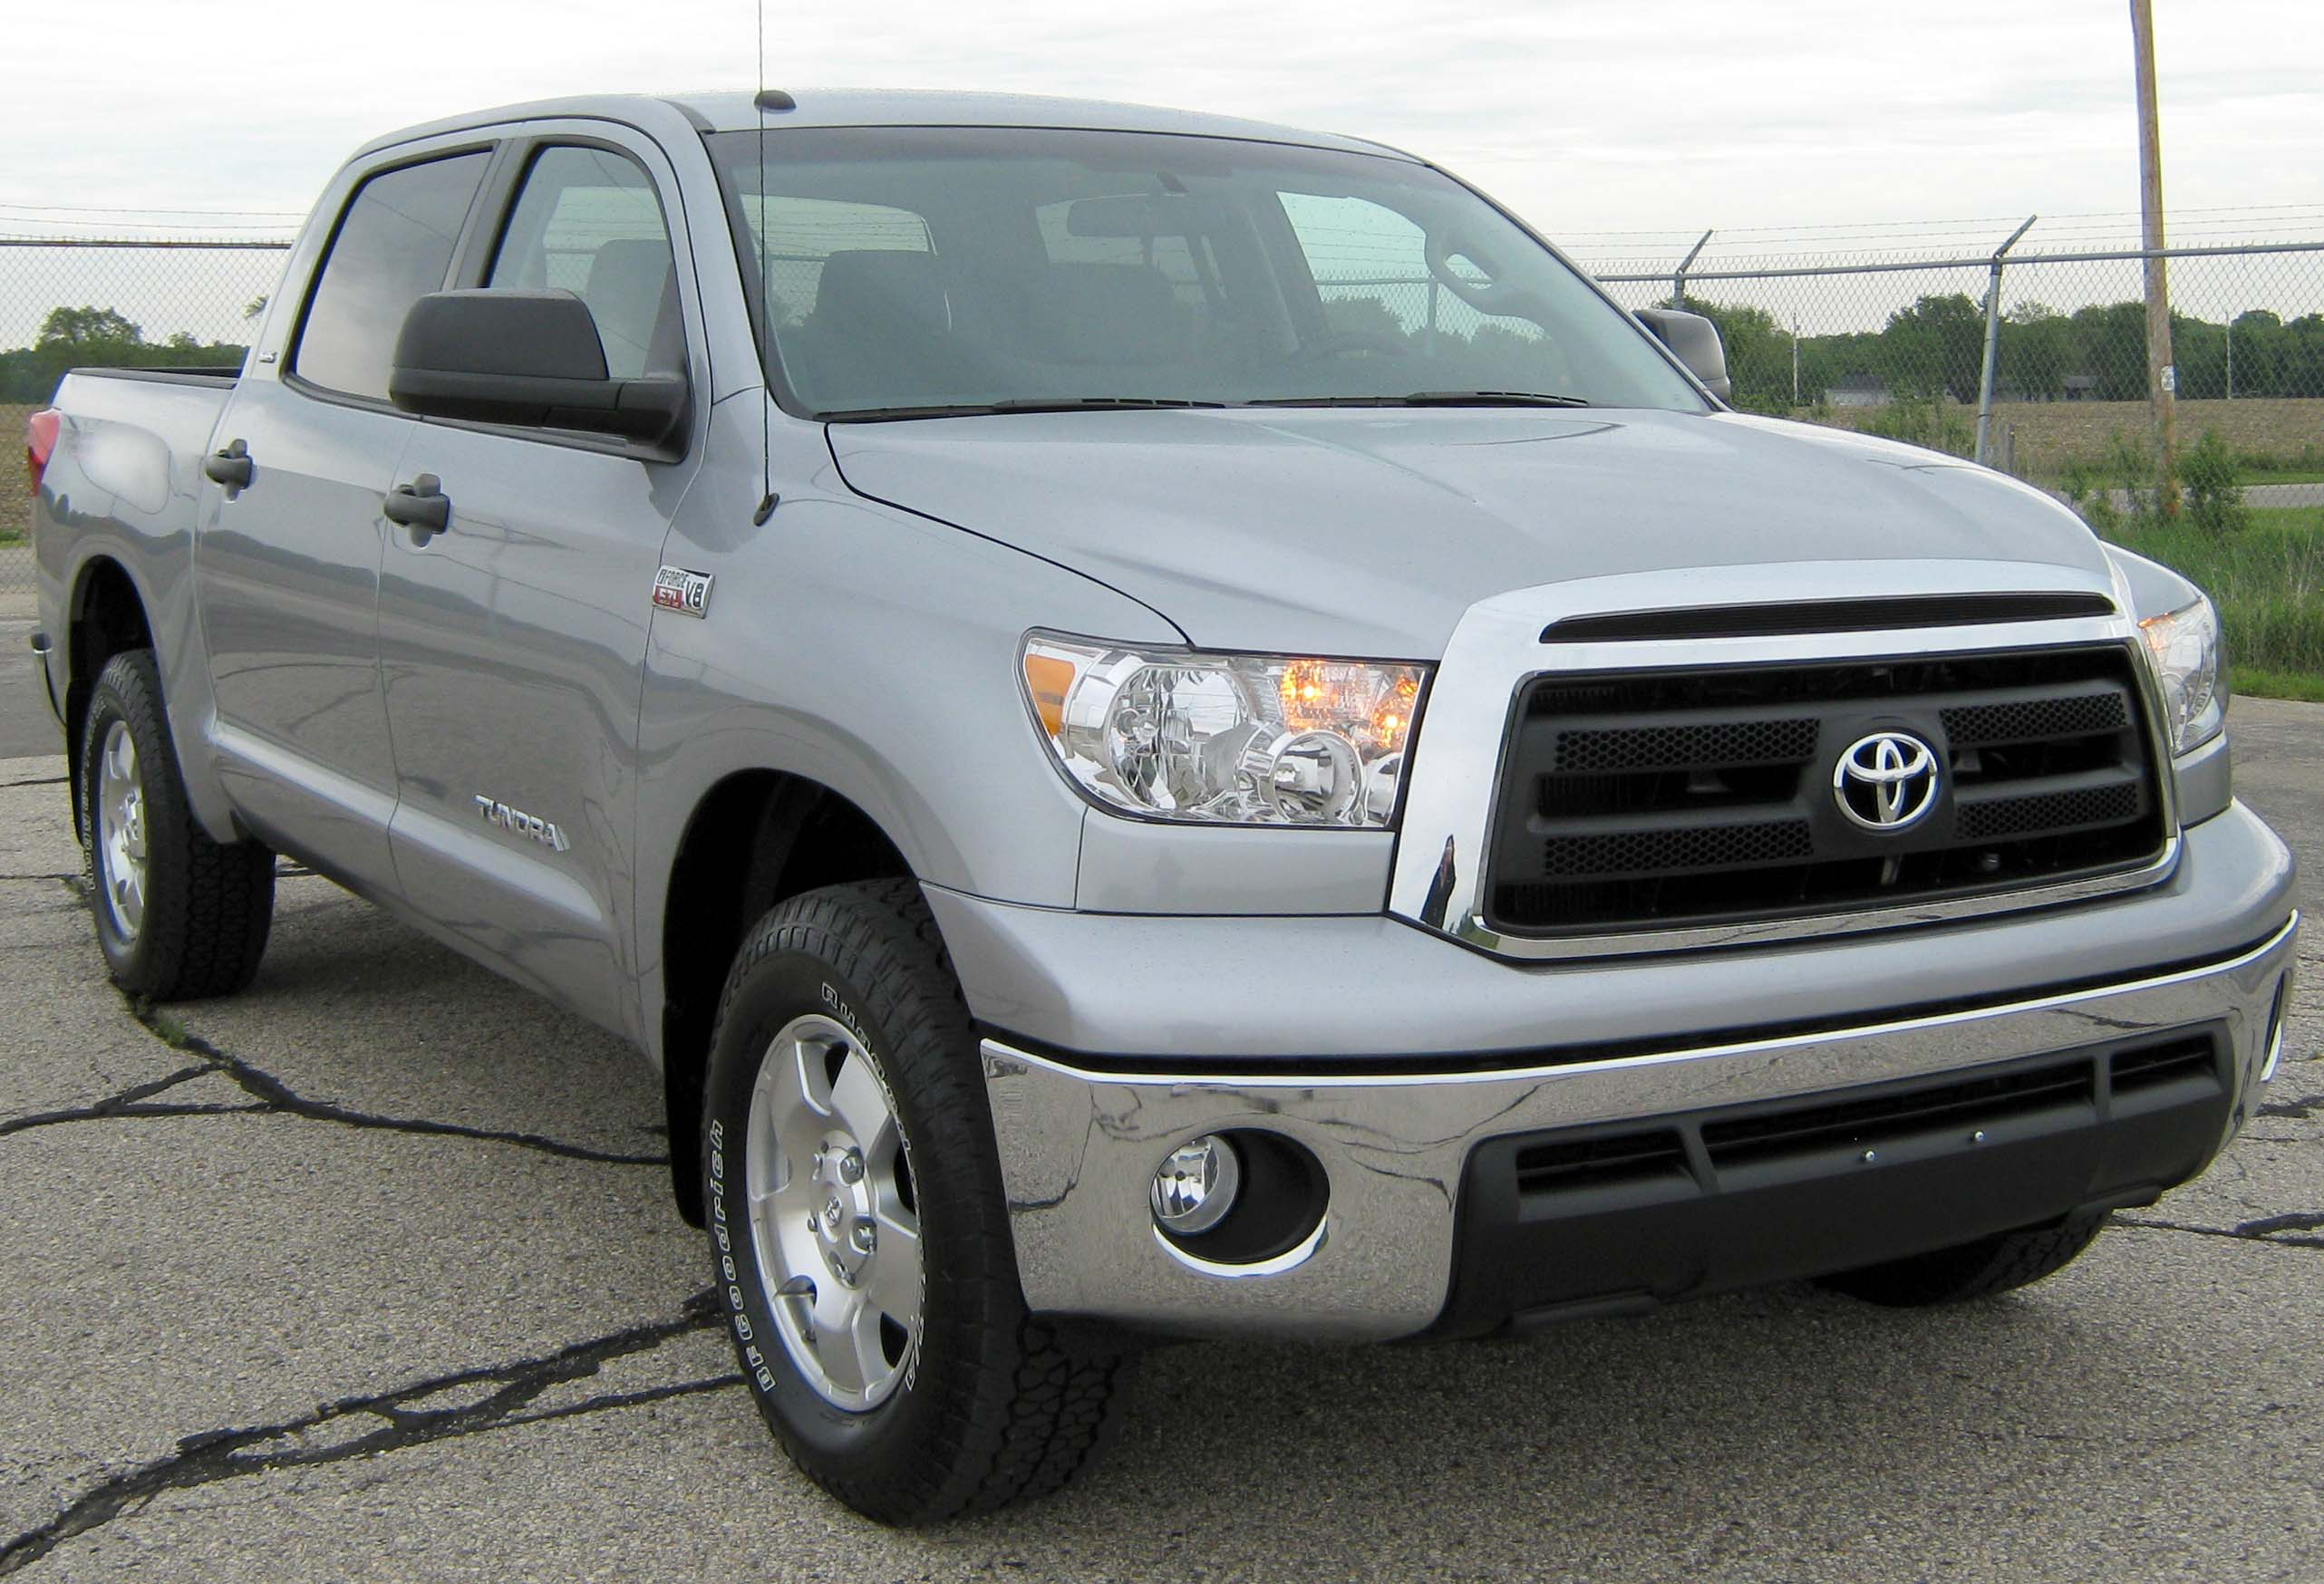 File:2010 Toyota Tundra CrewMax -- NHTSA.jpg - Wikimedia Commons